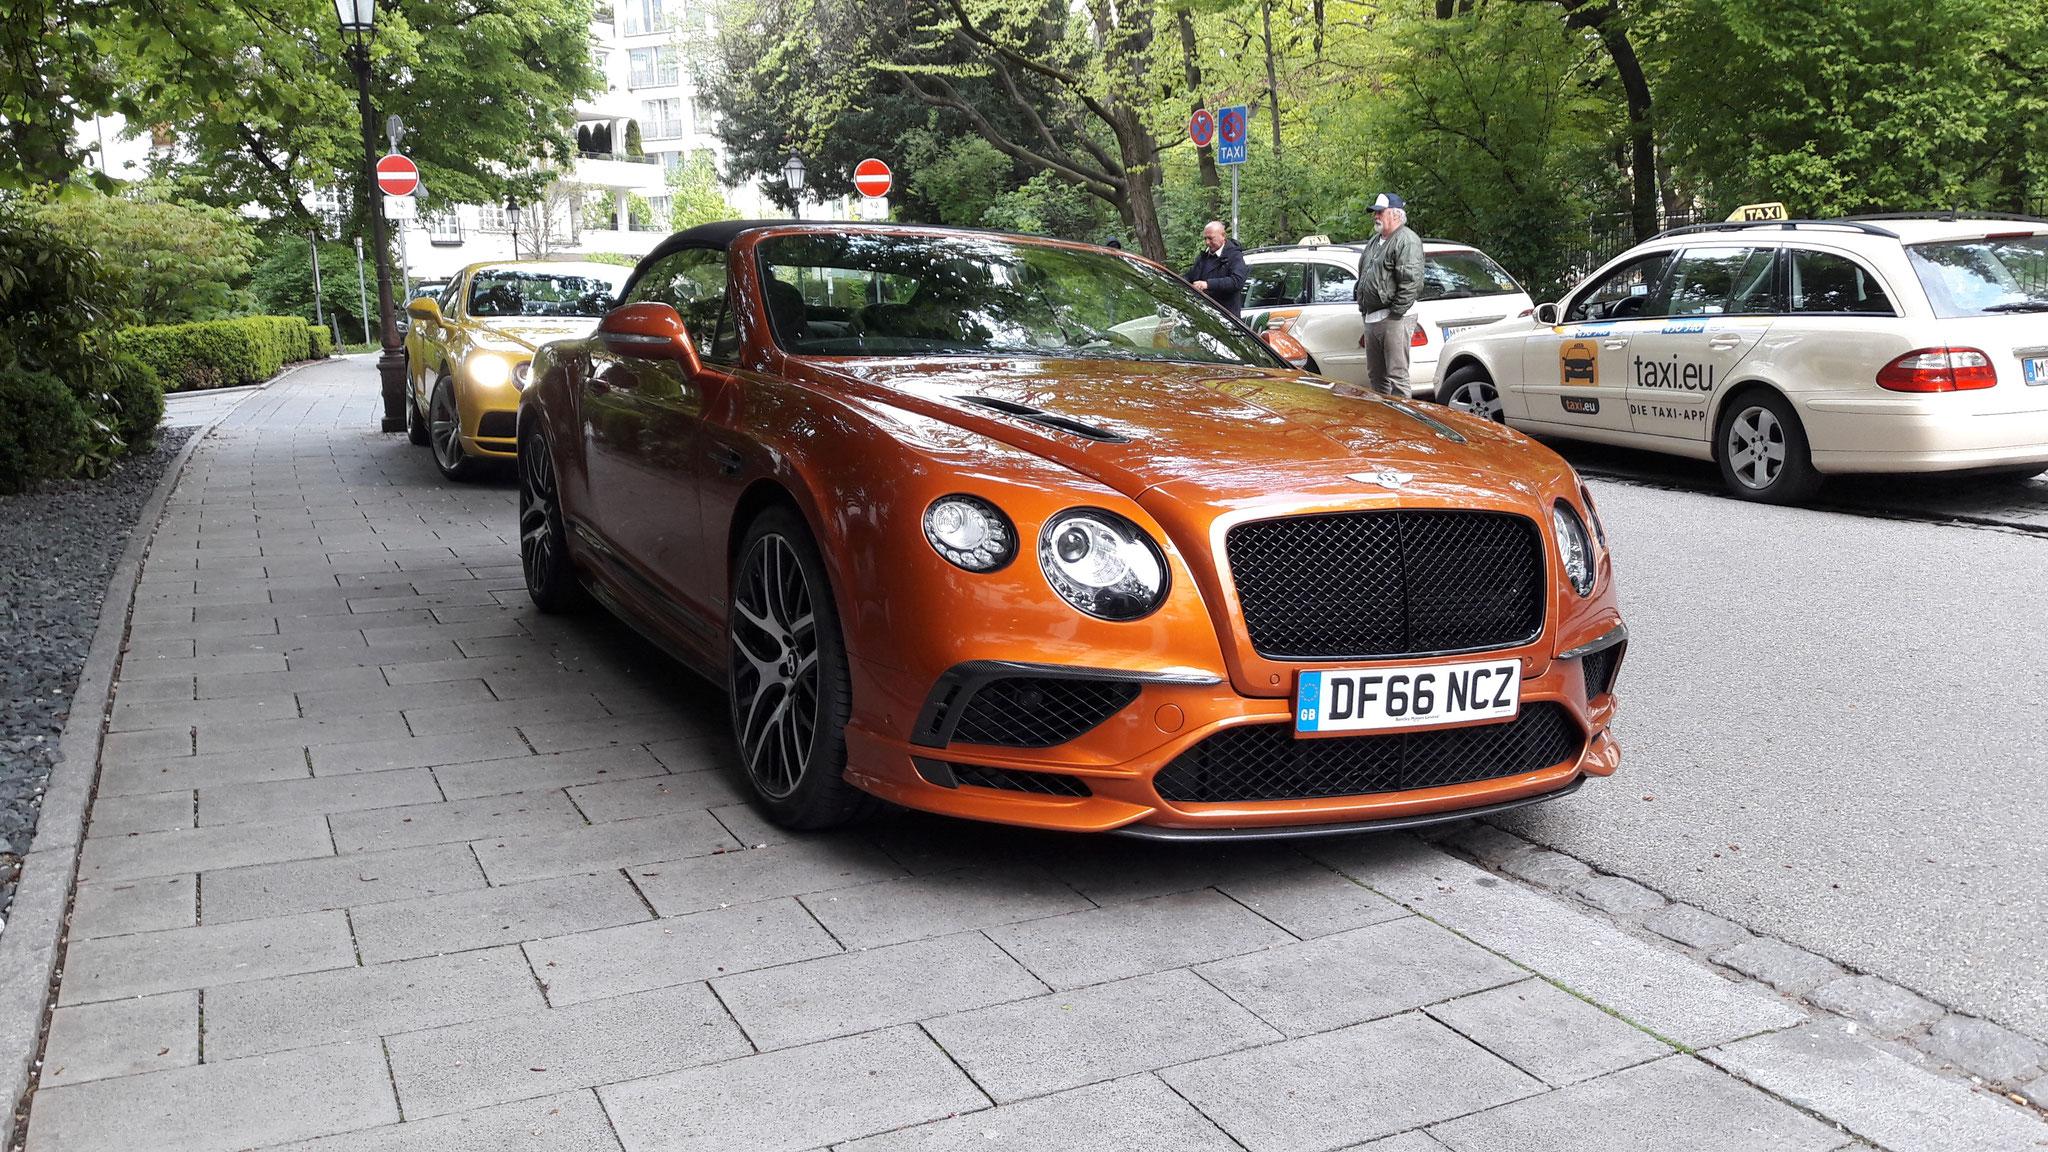 Bentley Continental GTC V8 S - DF66-NCZ